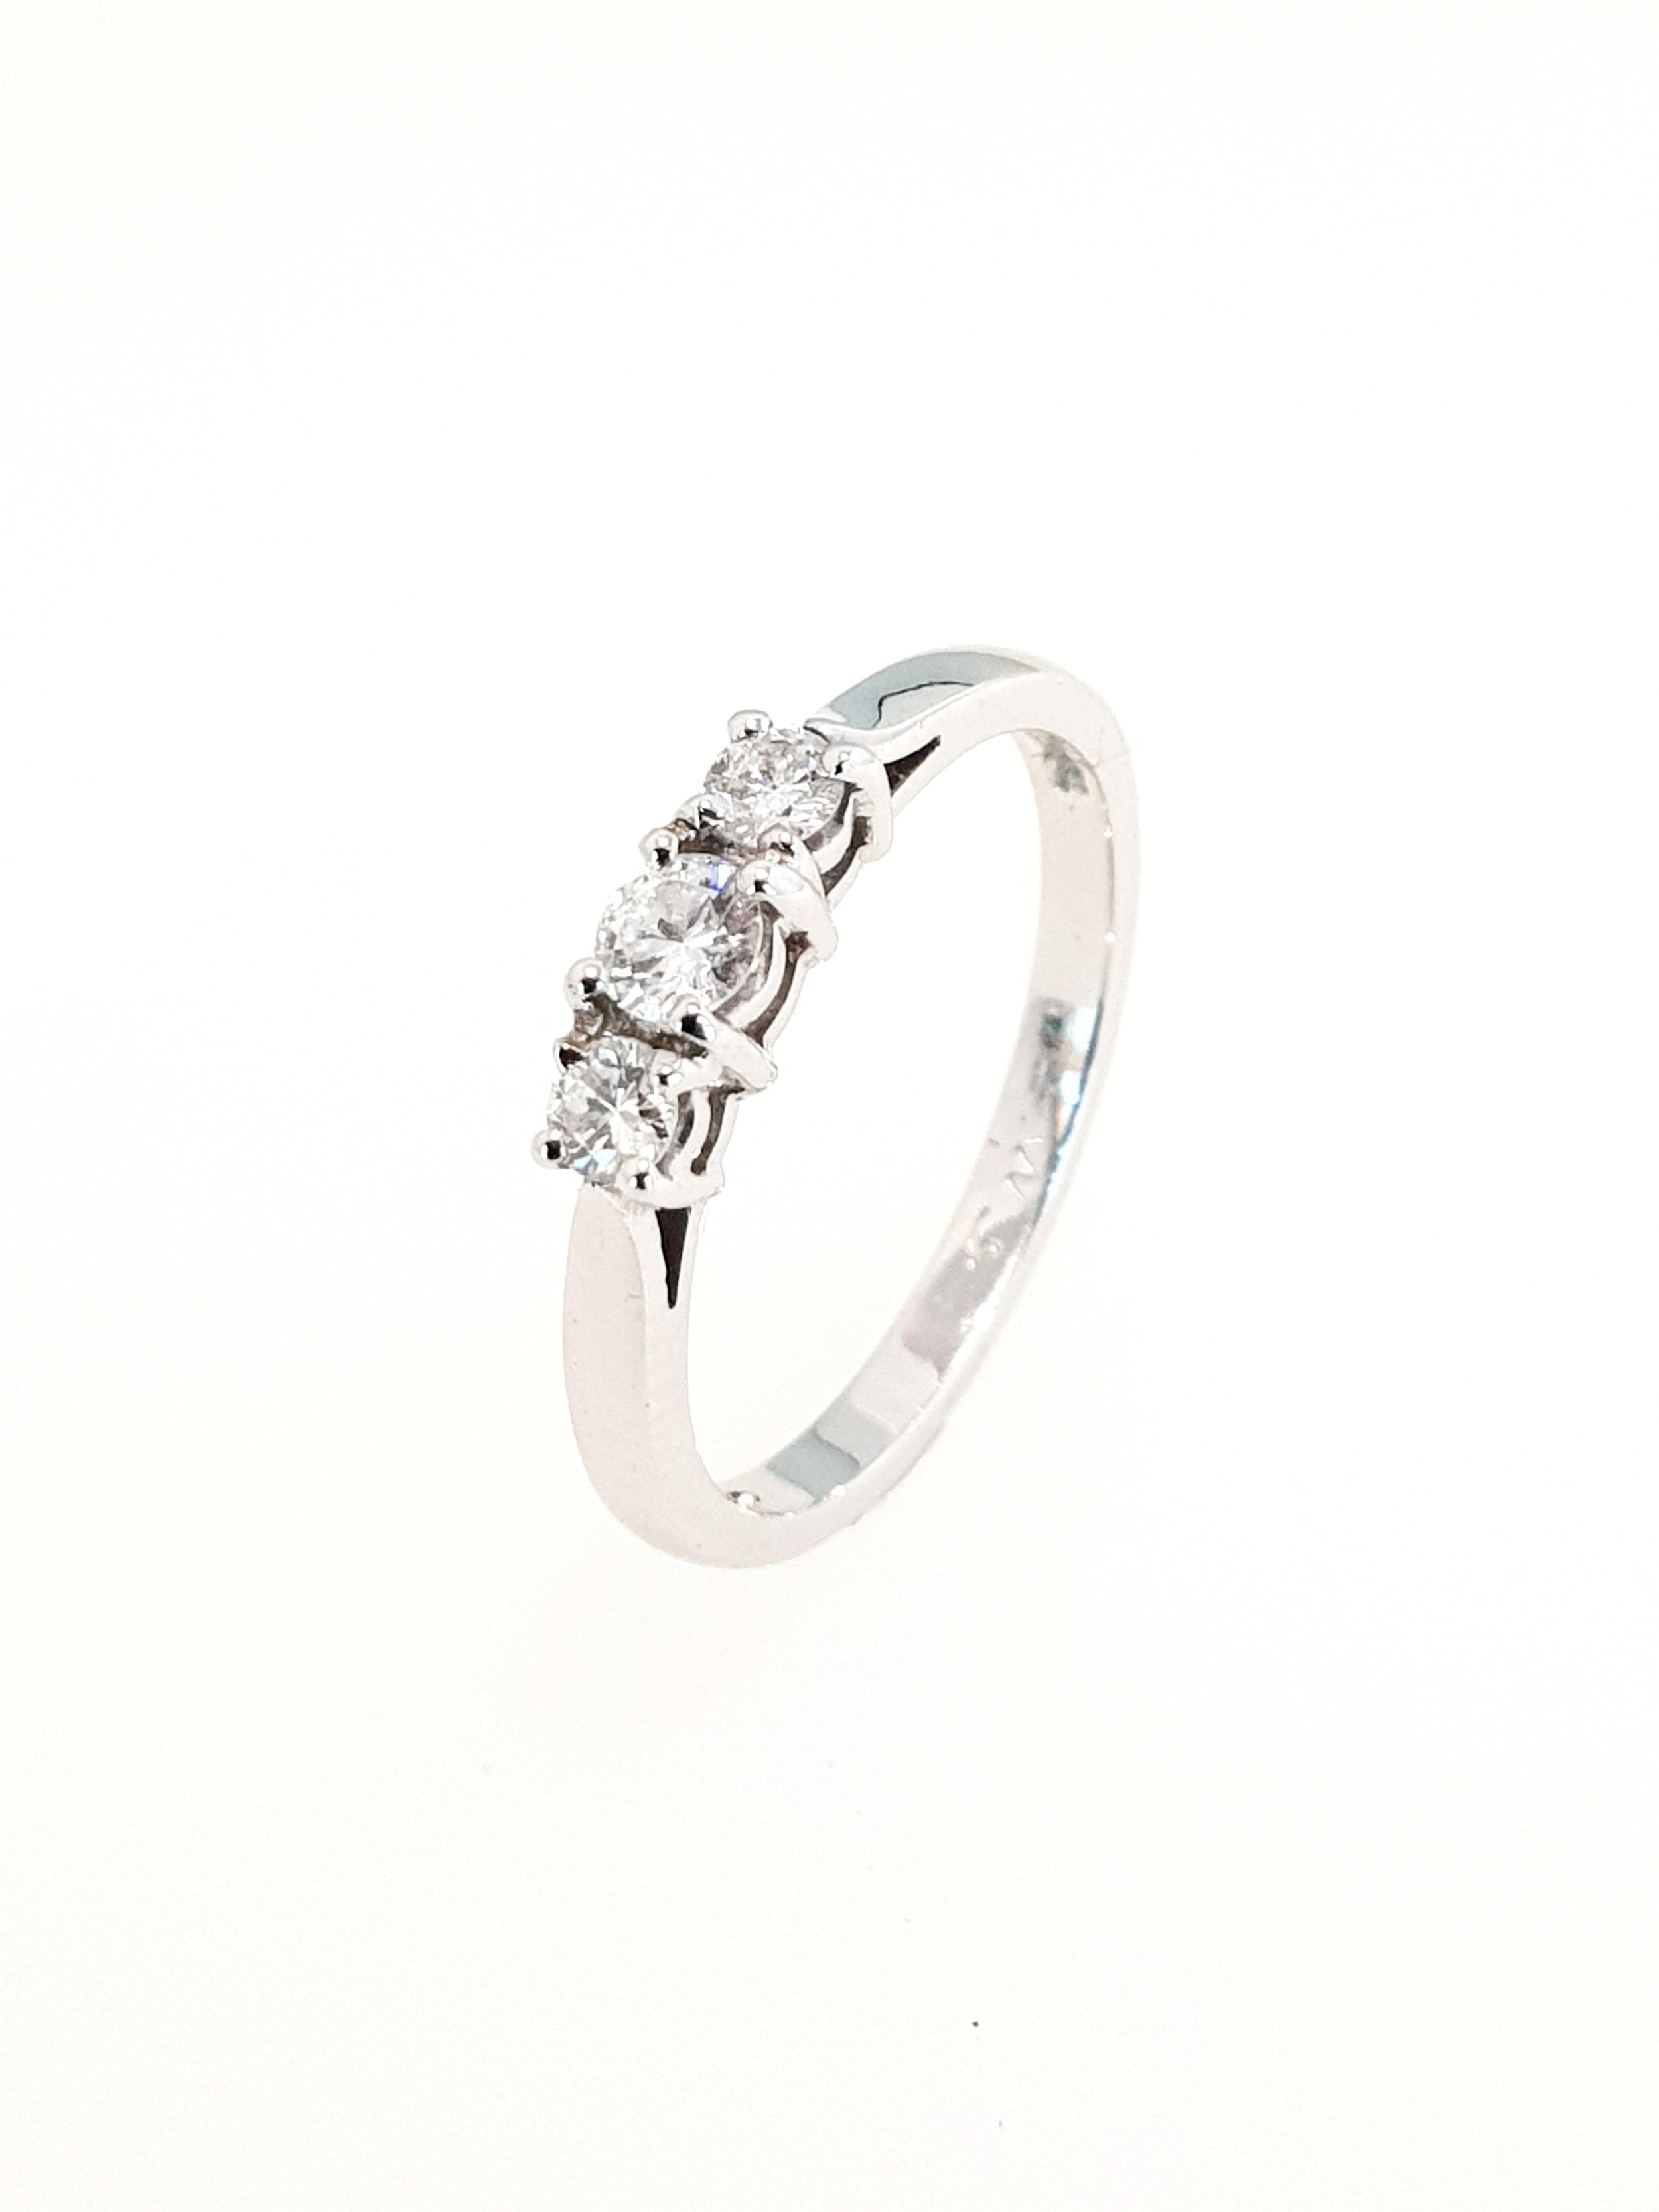 3 Stone Diamond Ring in Platinum  .30ct, G, Si2  Stock Code: N7574  £1610